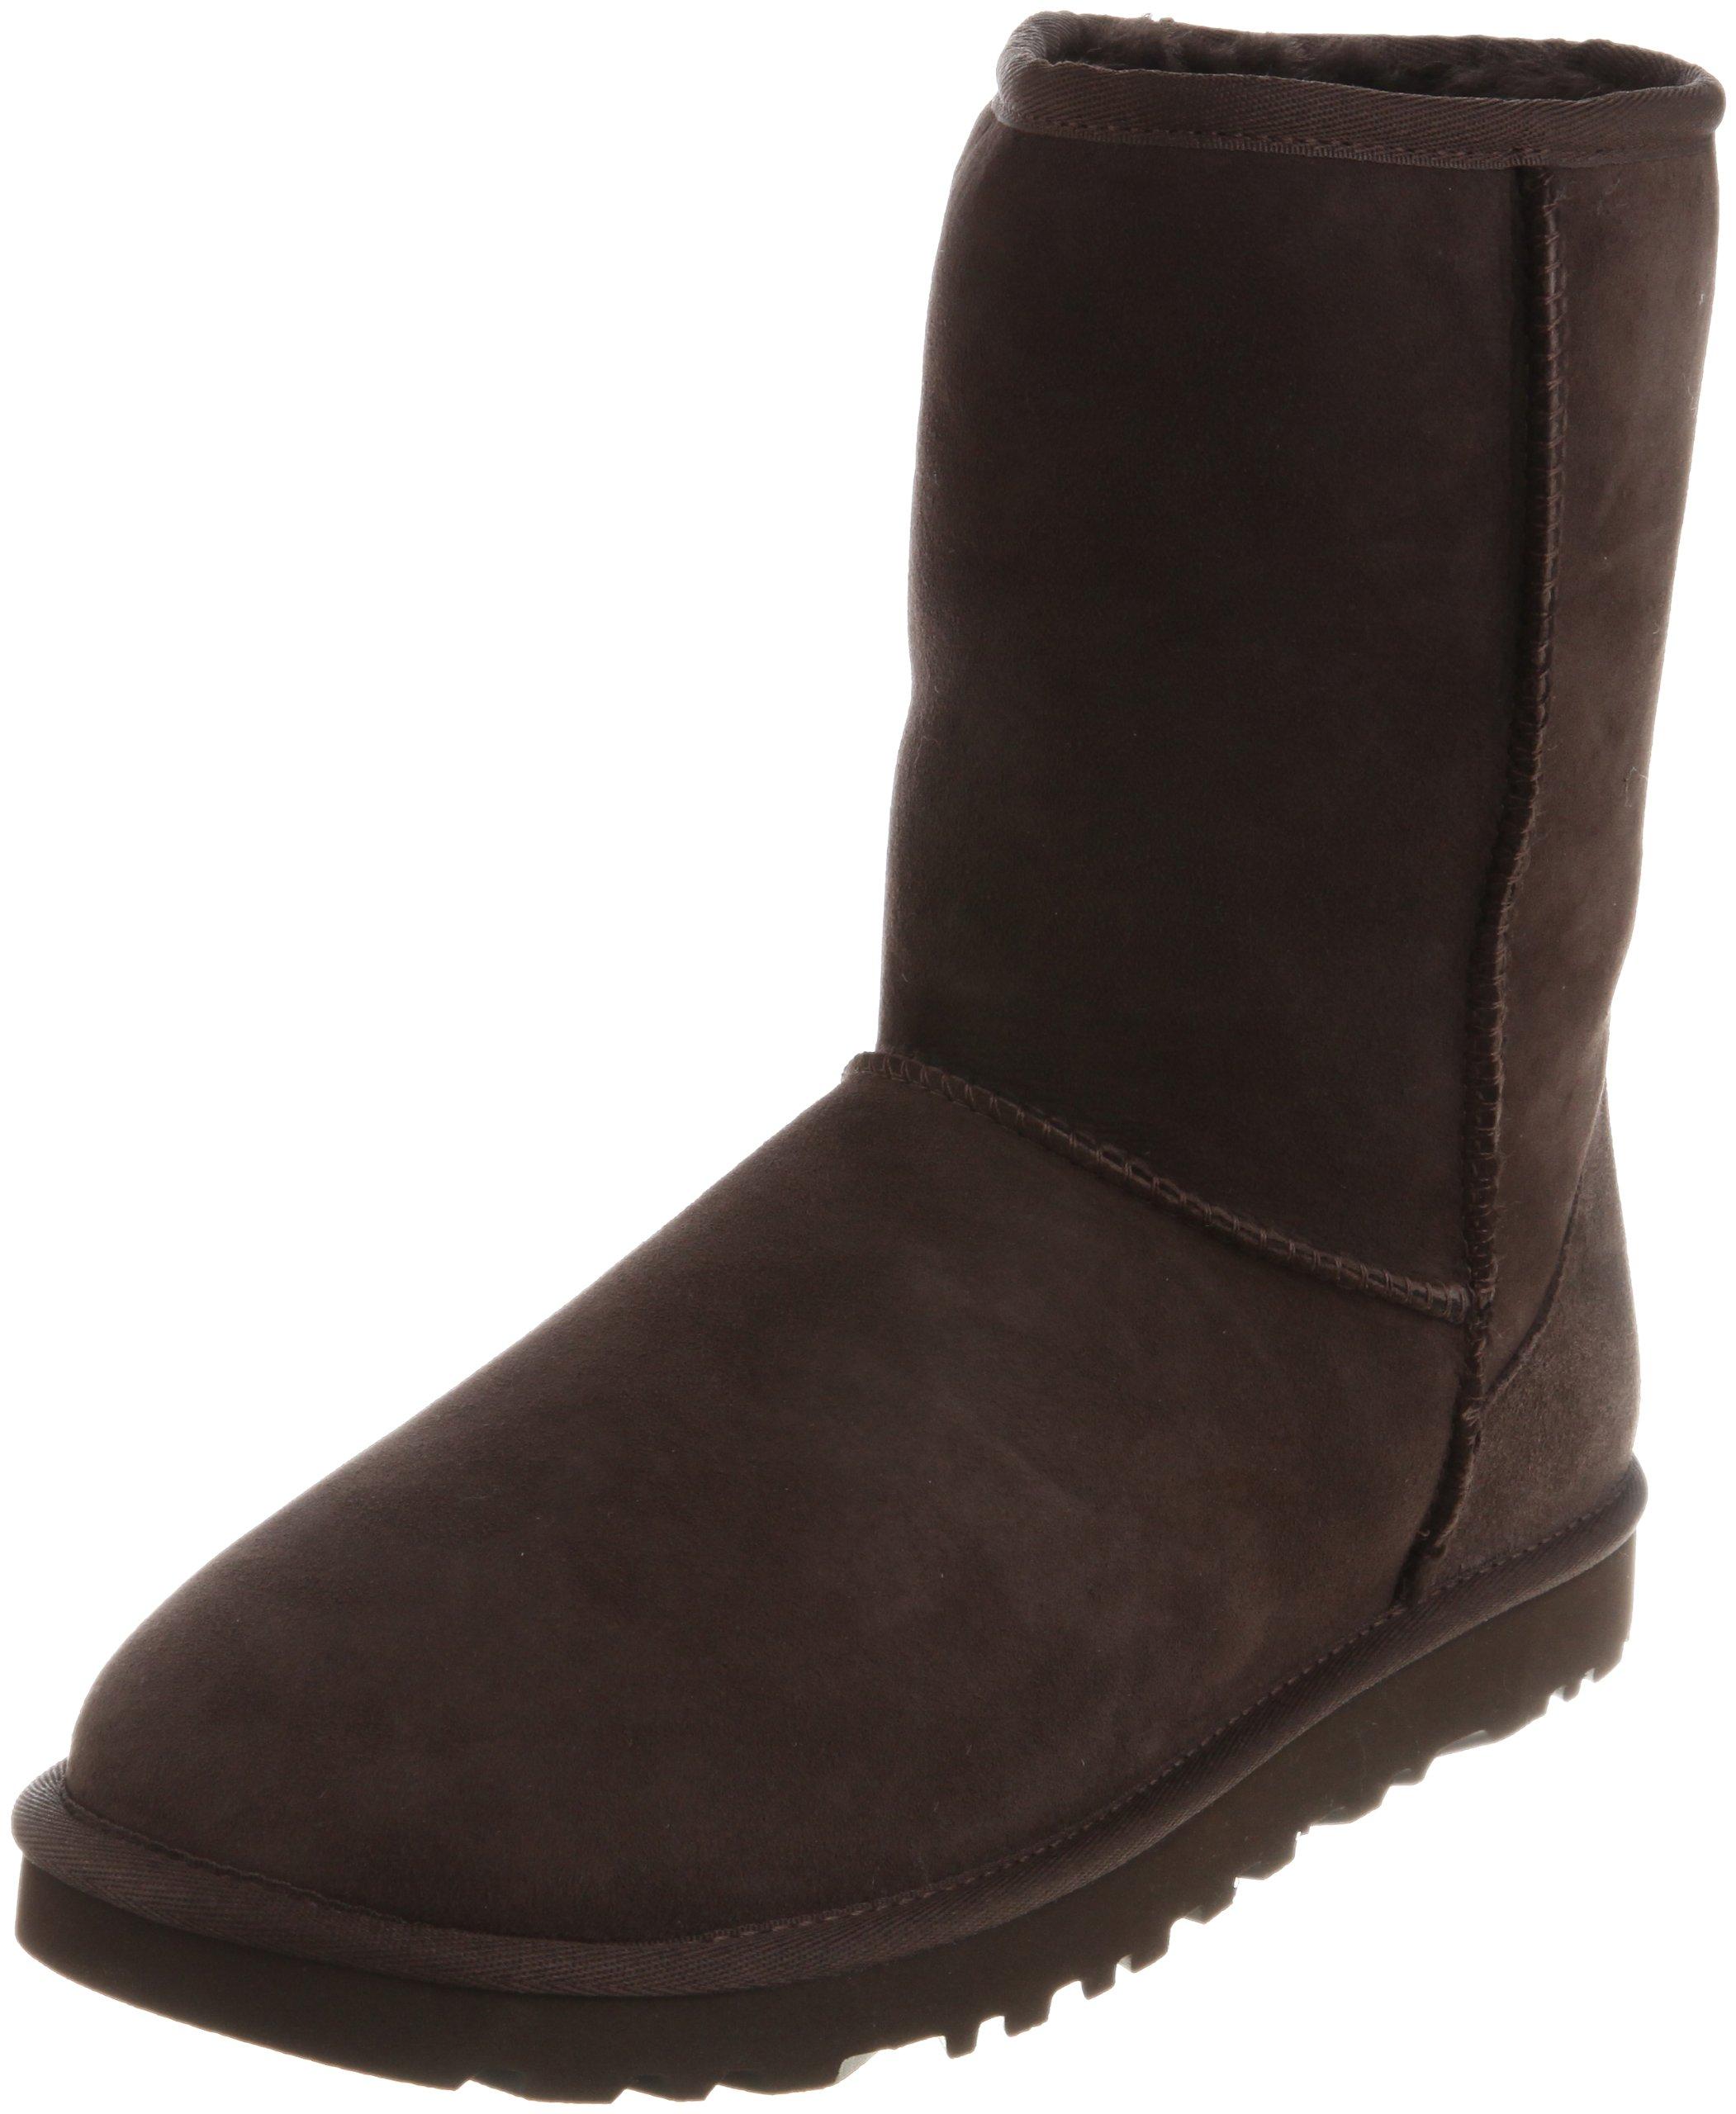 UGG Men's Classic Short Sheepskin Boots, Chocolate, Medium / 7 D(M) US